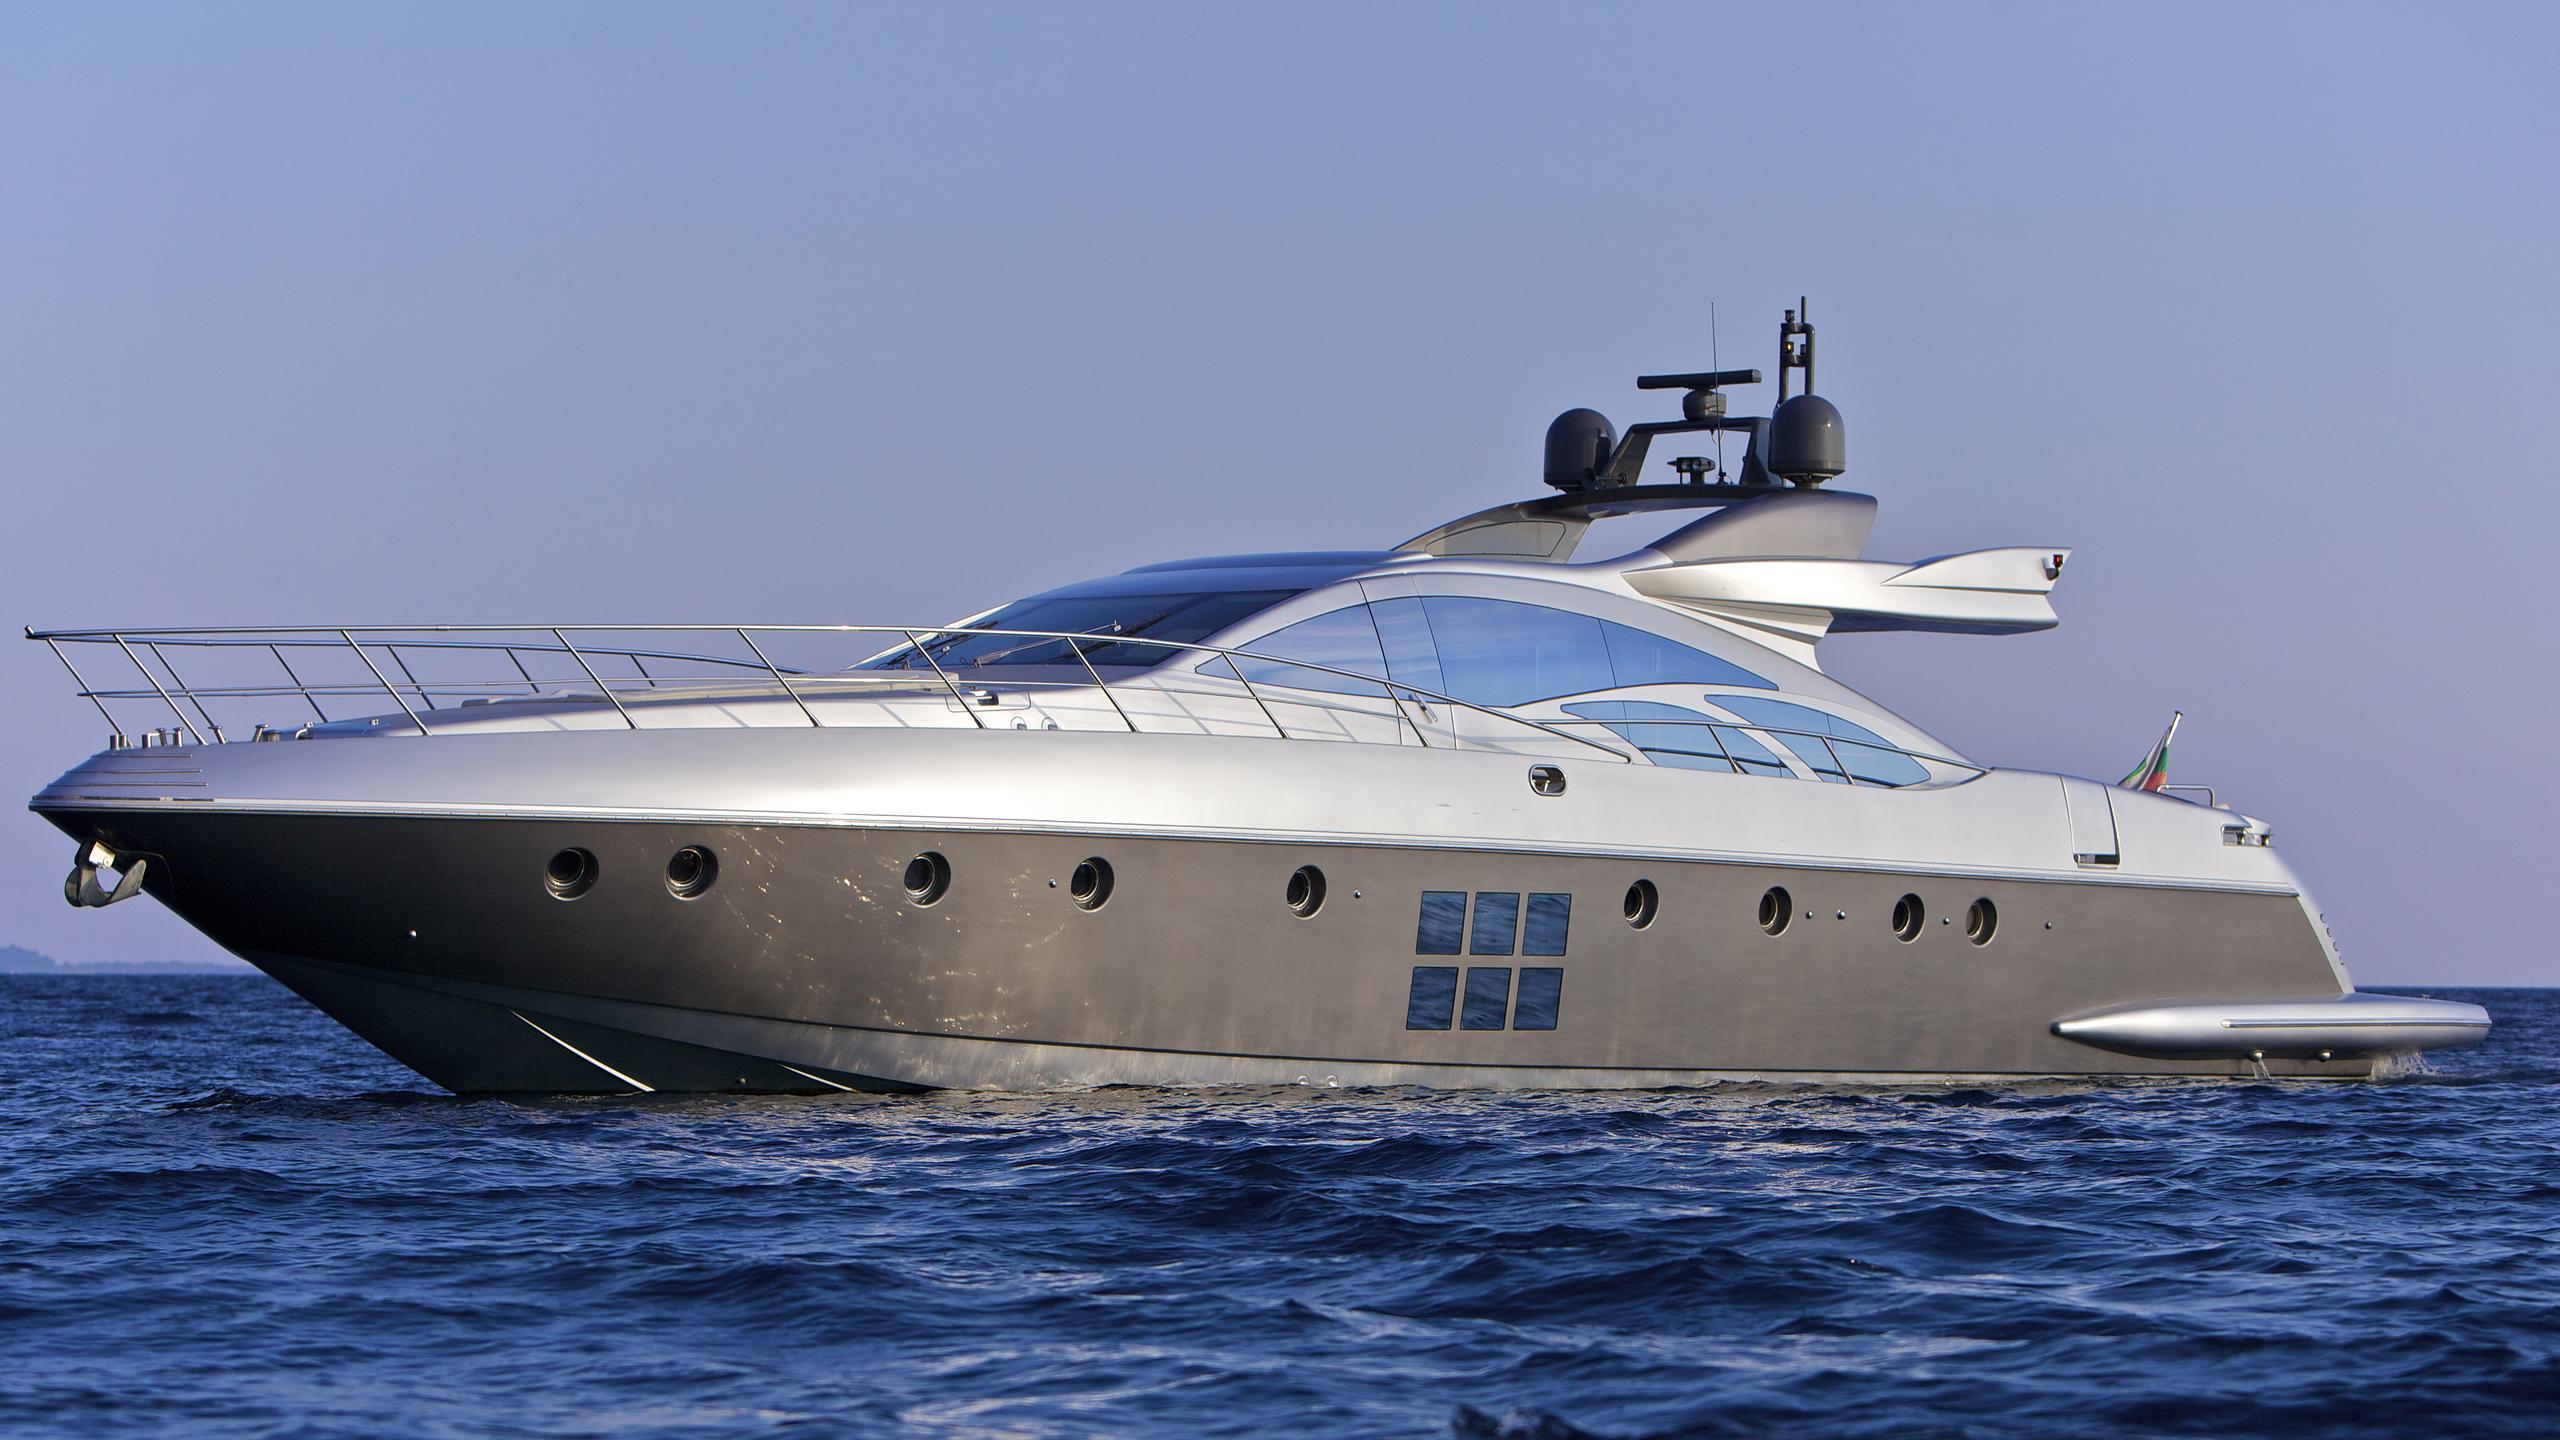 thea-malta-yacht-at-sea